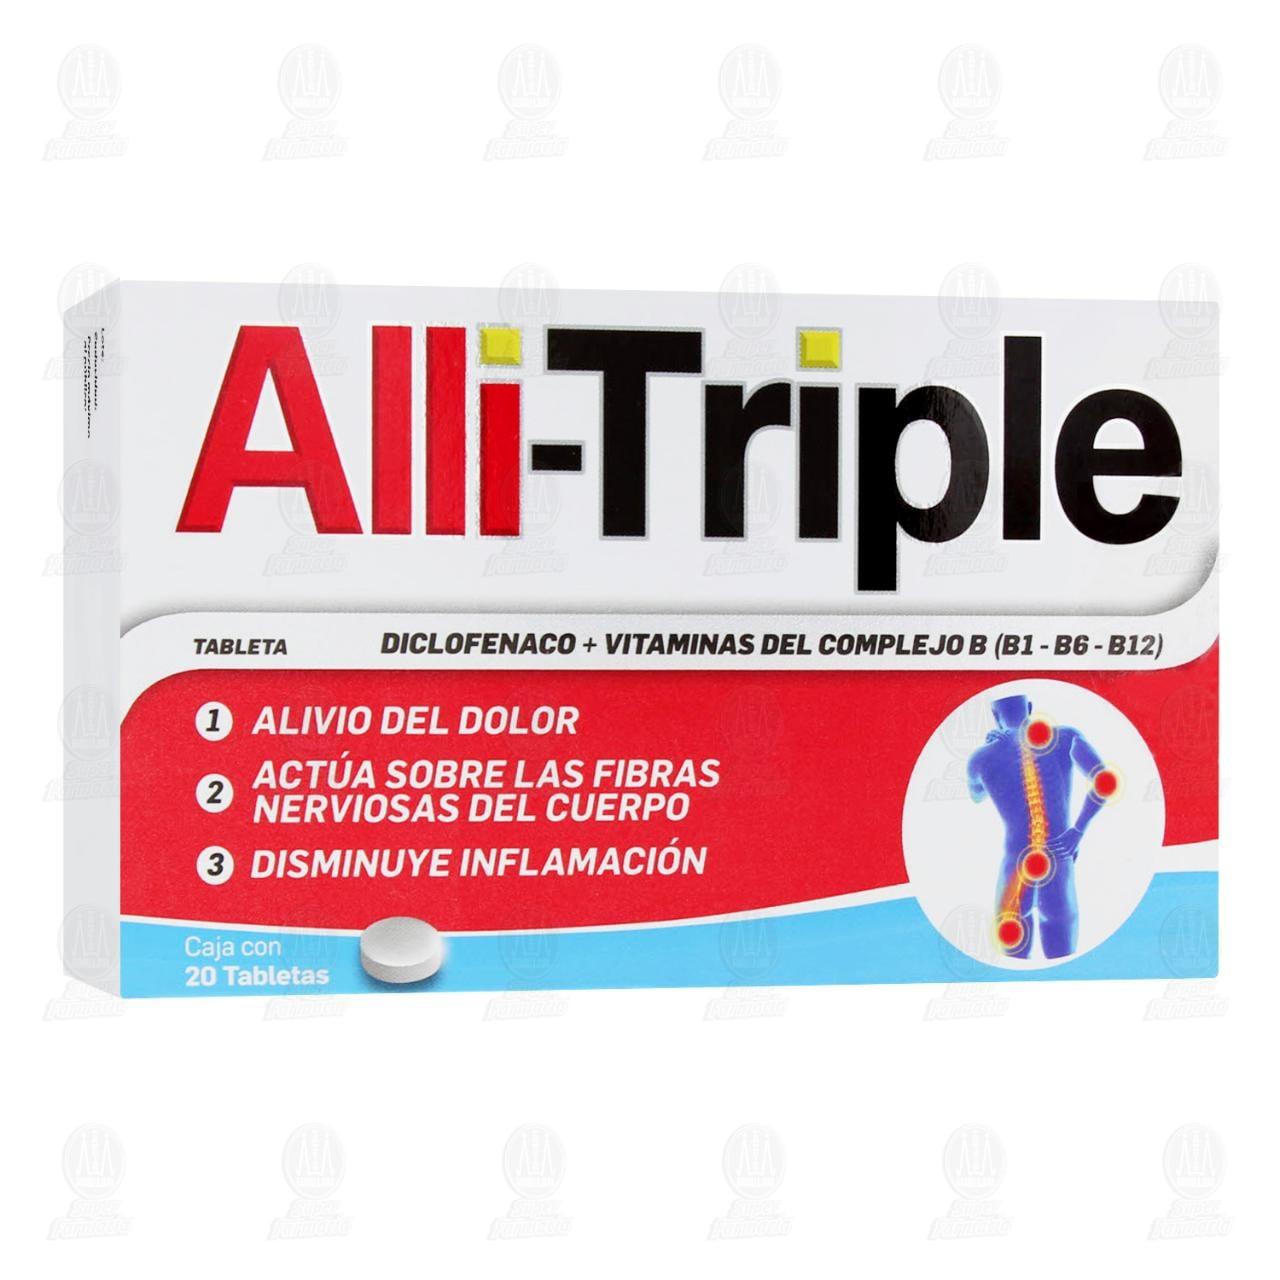 Comprar Alli-Triple 20 Tabletas en Farmacias Guadalajara